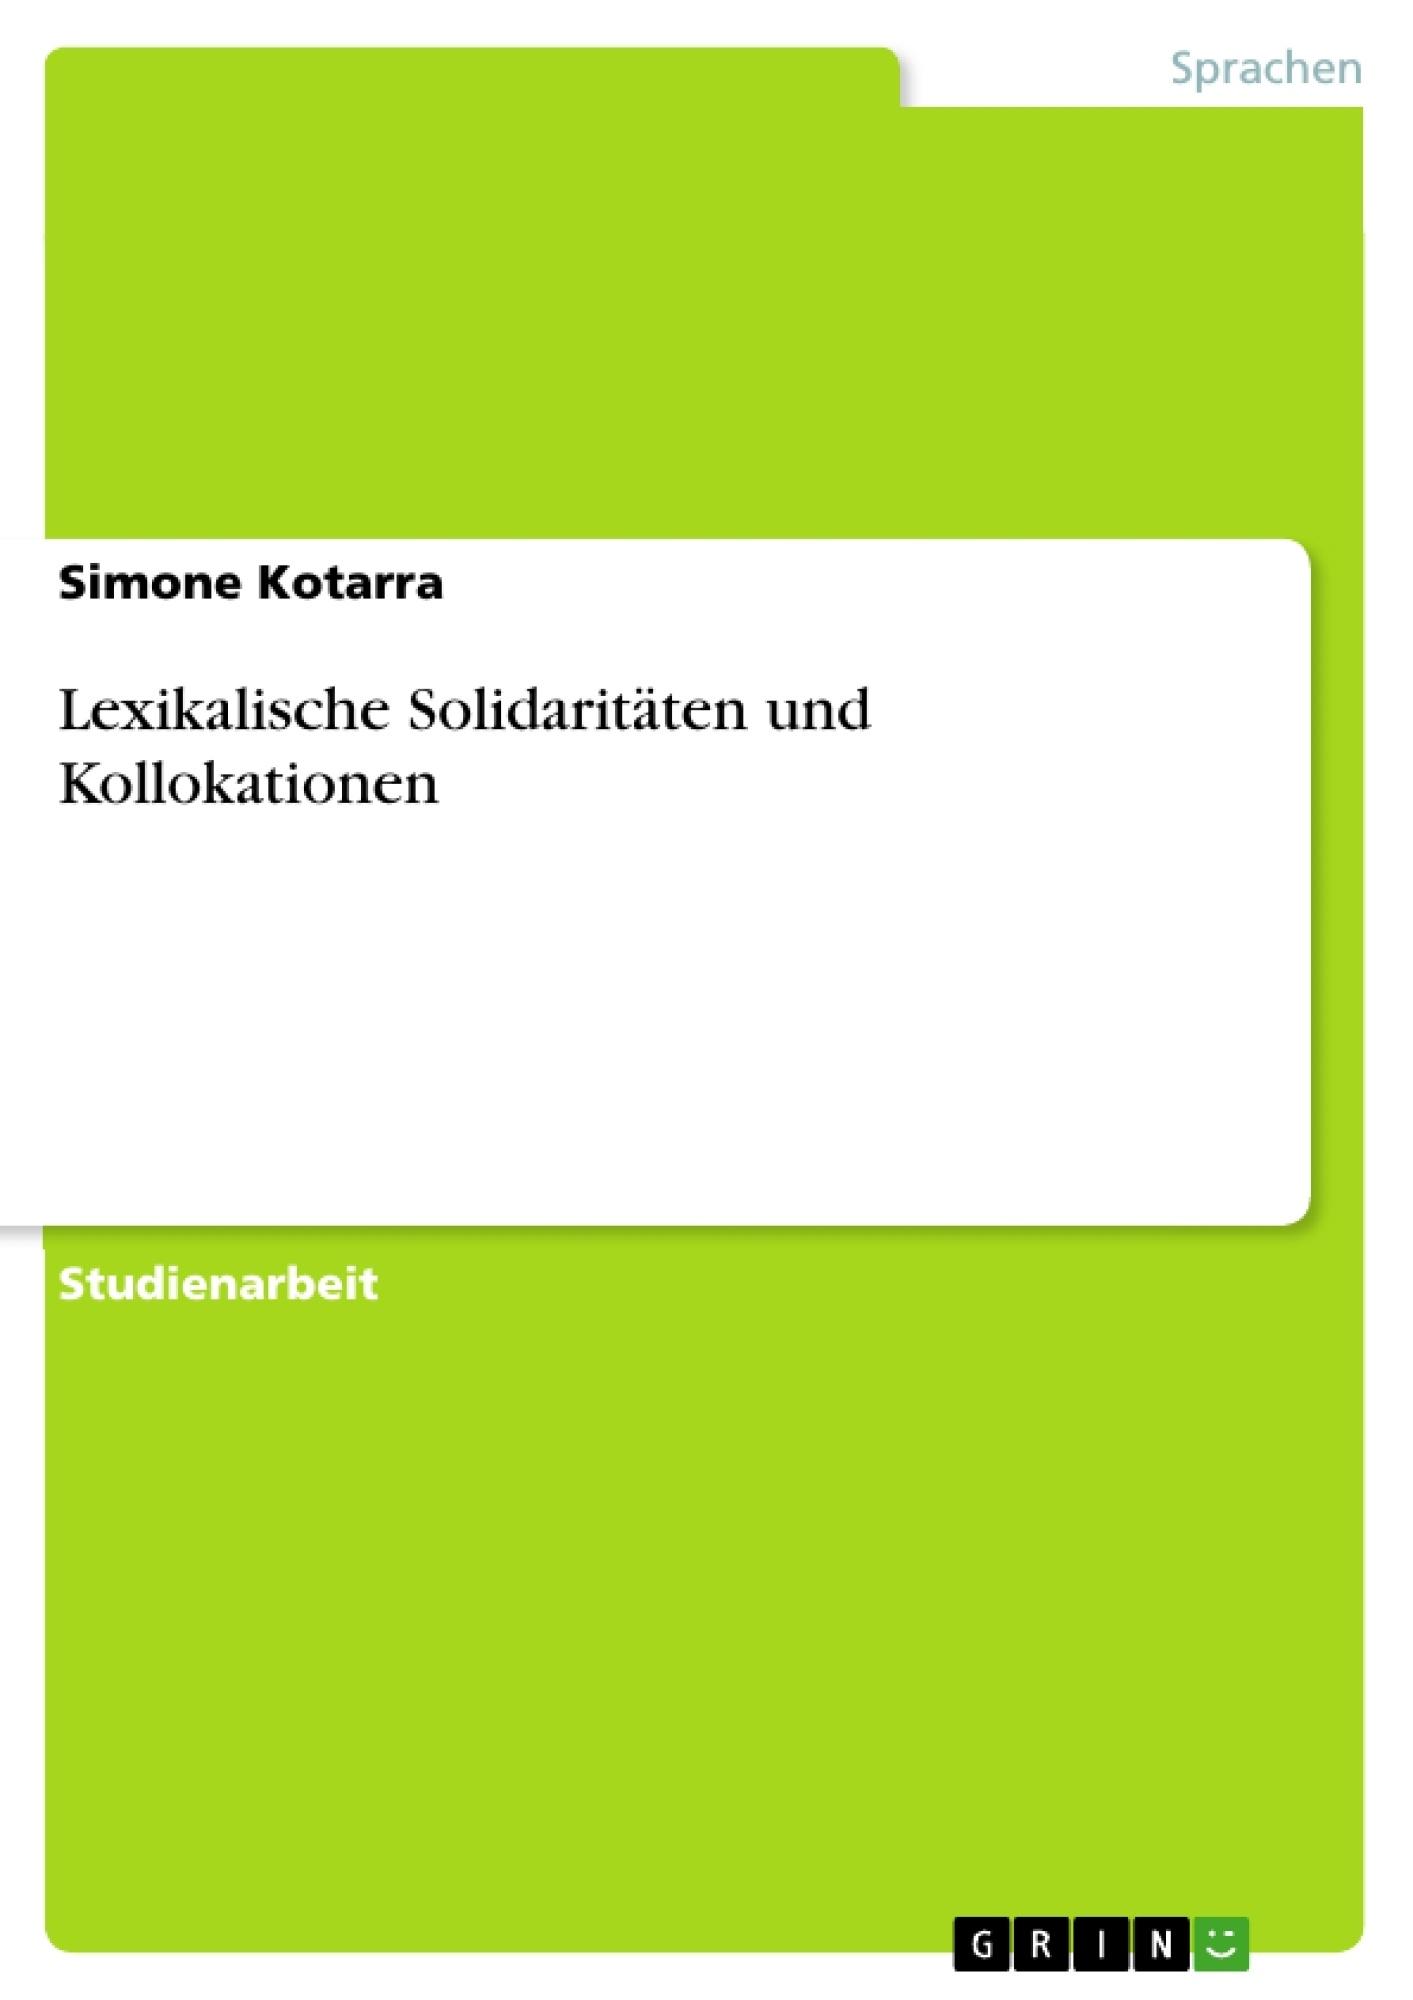 Titel: Lexikalische Solidaritäten und Kollokationen